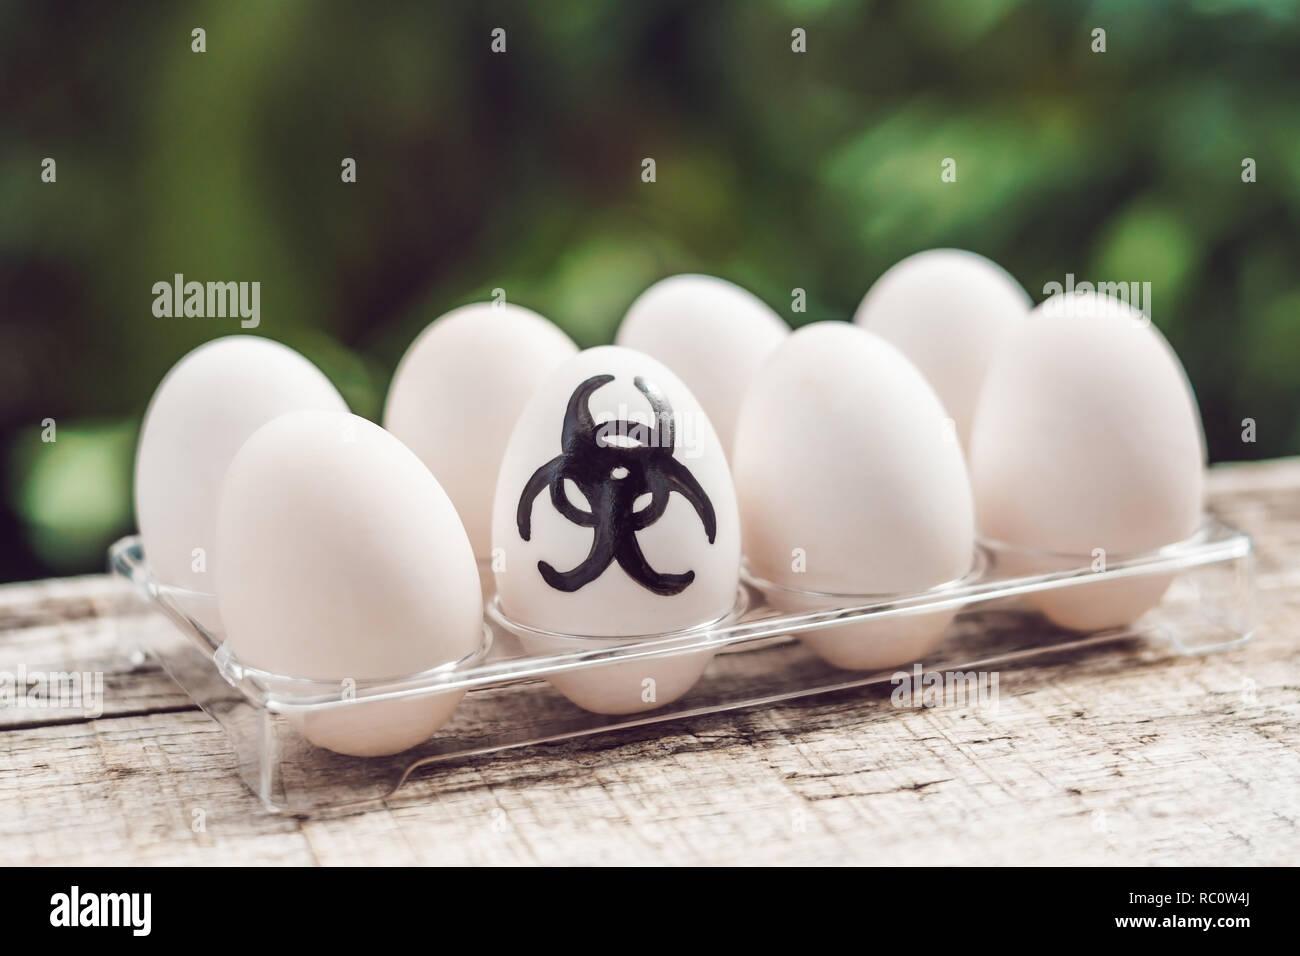 Sign of bio-hazard on the egg. The concept of disease. Avian influenza, salmanese.. - Stock Image